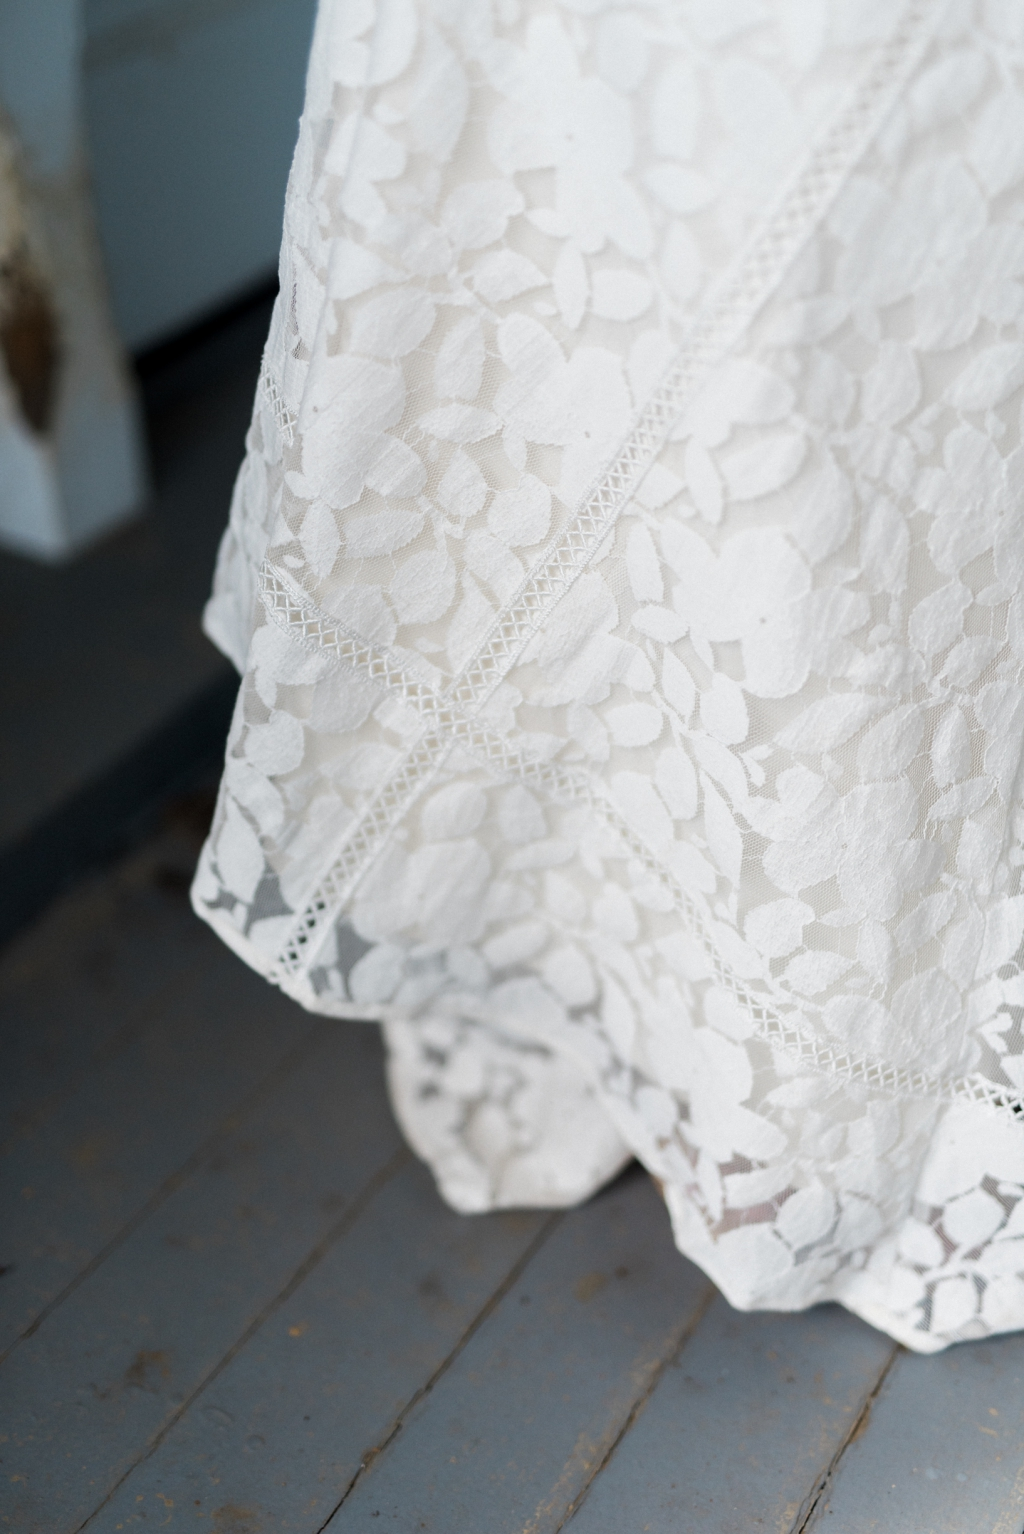 haley-richter-photography-buena-vista-confrence-center-wedding-summer-091